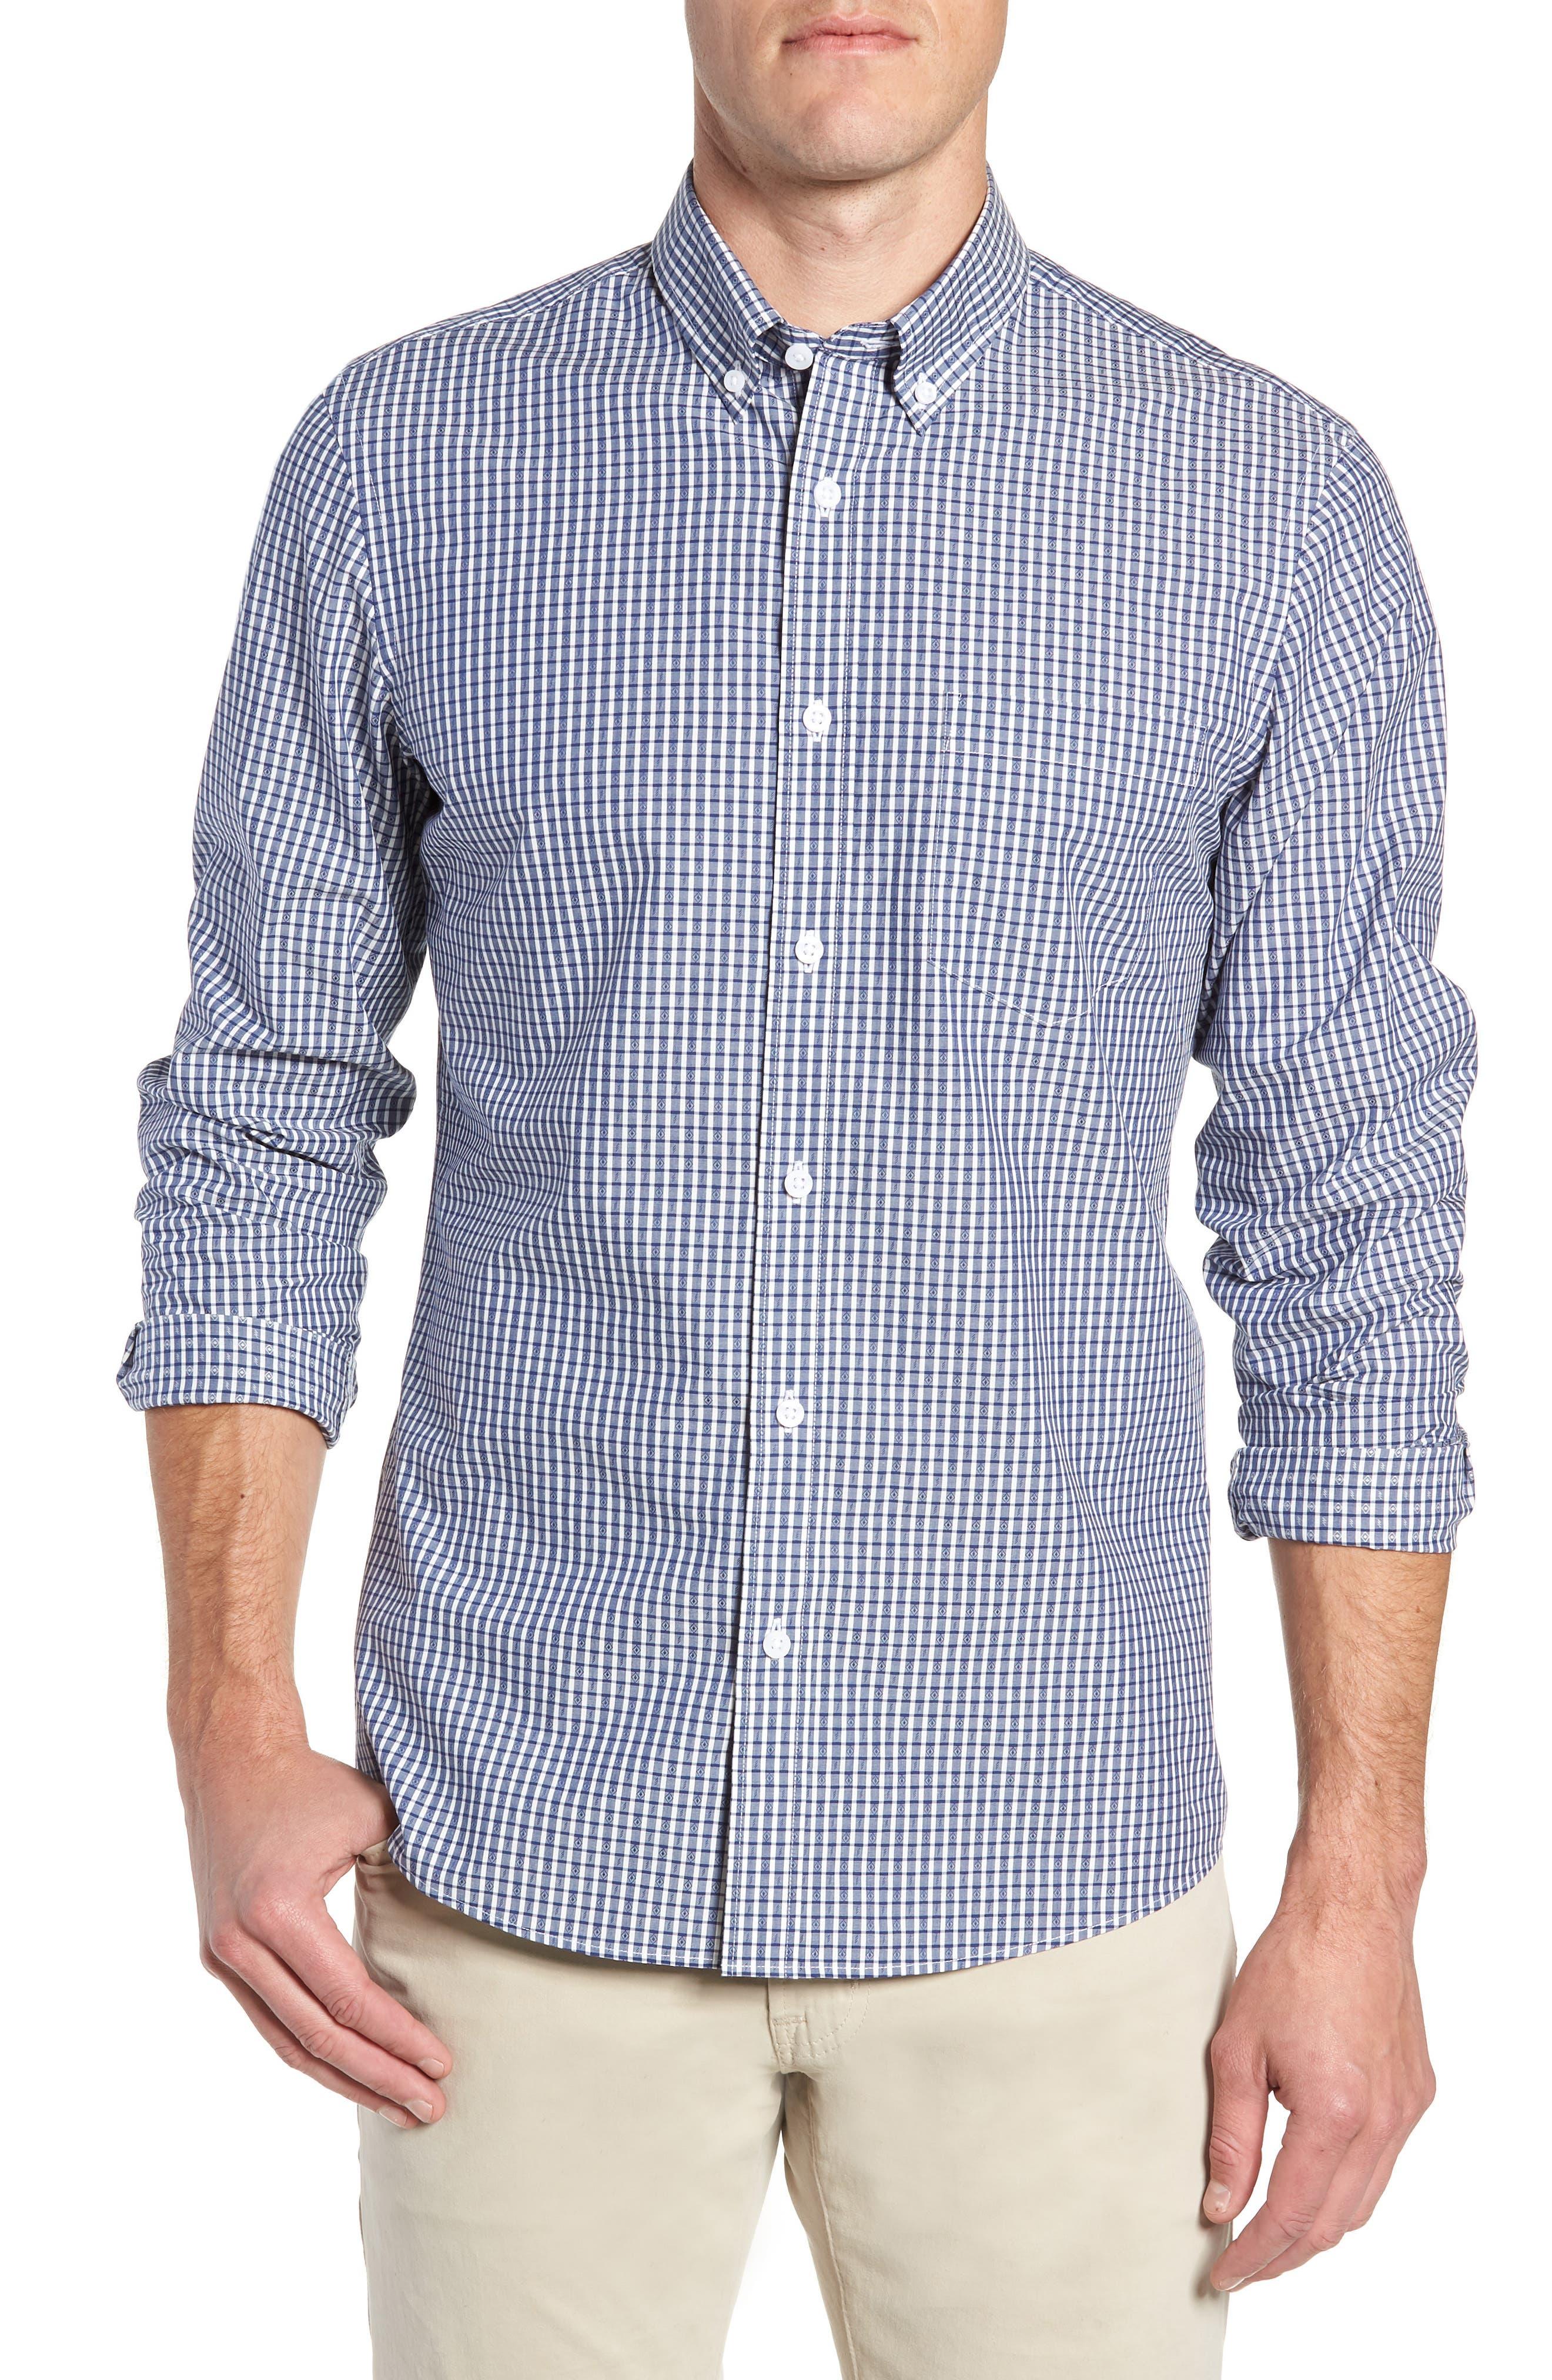 Nordstrom Shop Traditional Fit Jacquard Sport Shirt, Blue